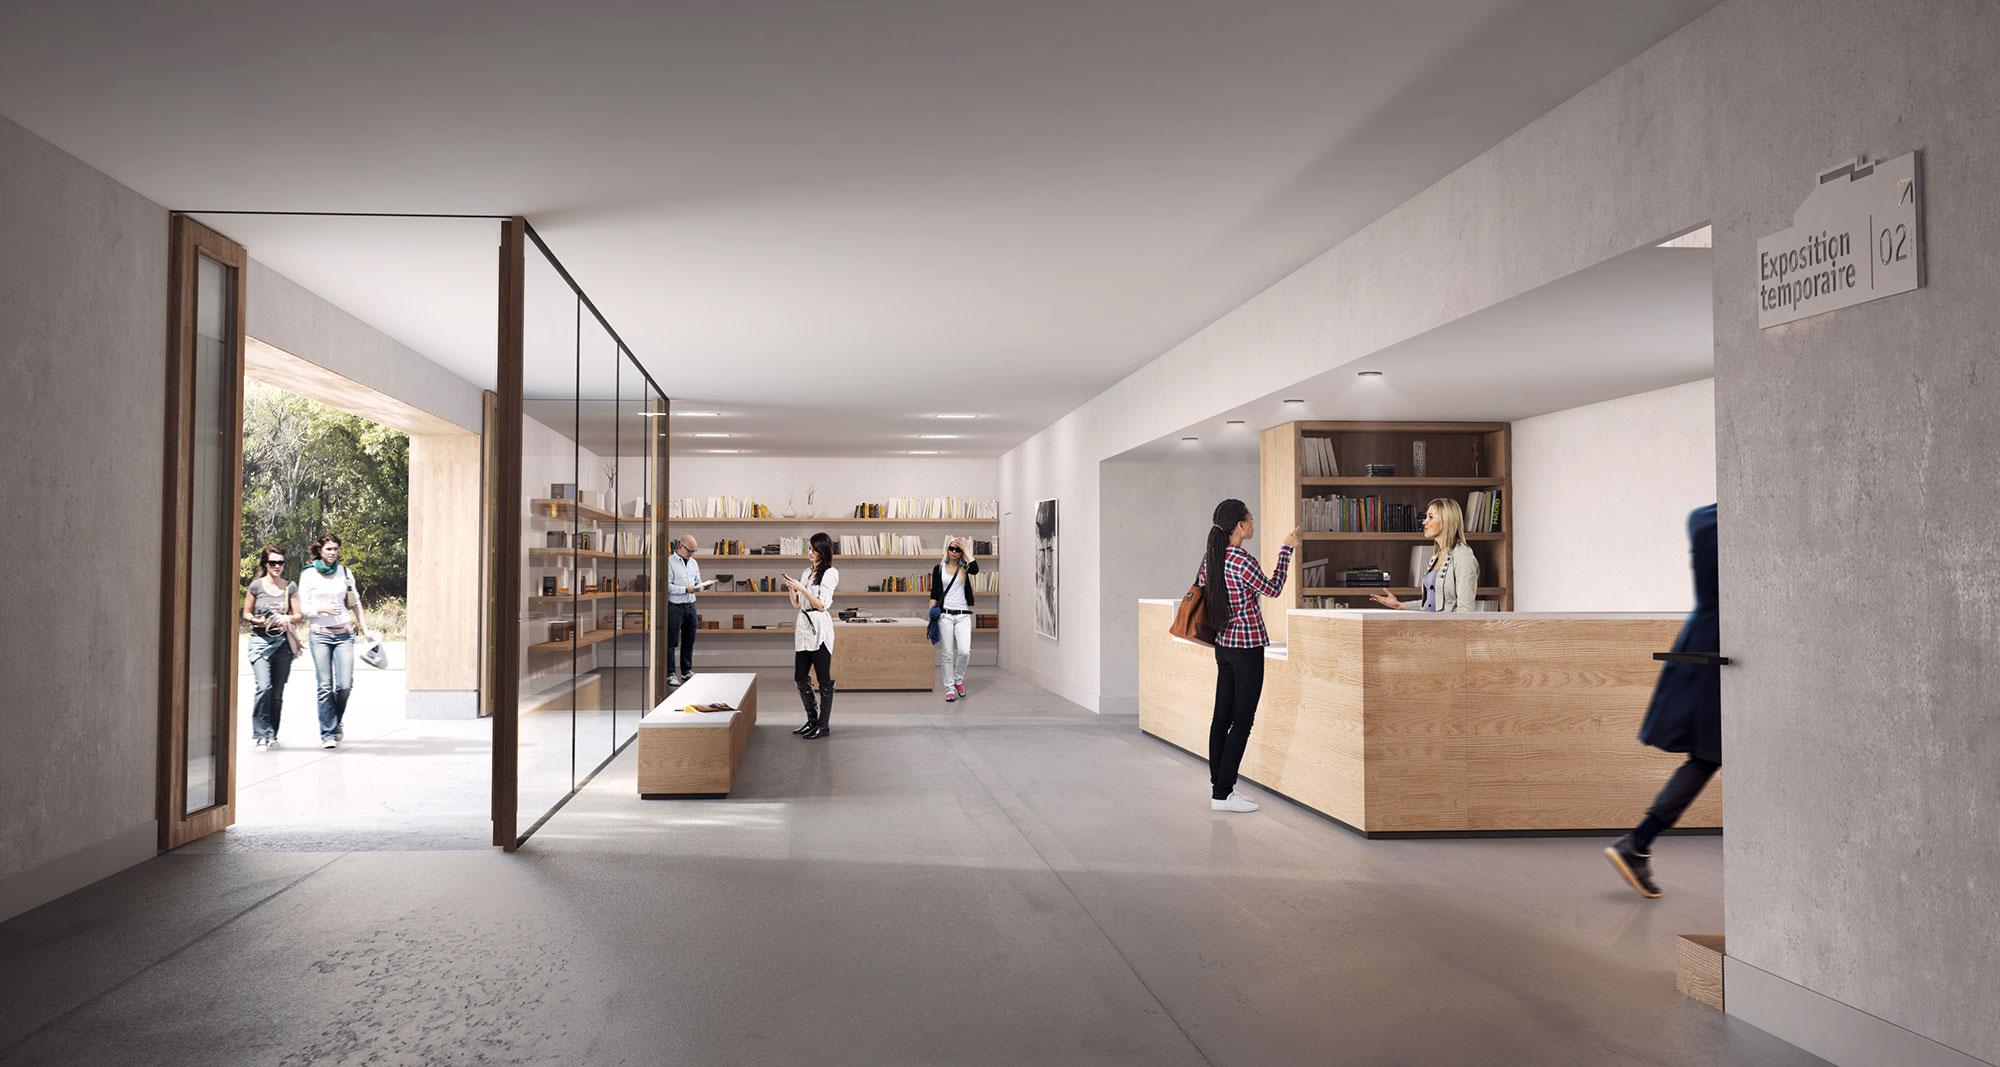 malauc ne grenier d architecture combas architectes. Black Bedroom Furniture Sets. Home Design Ideas